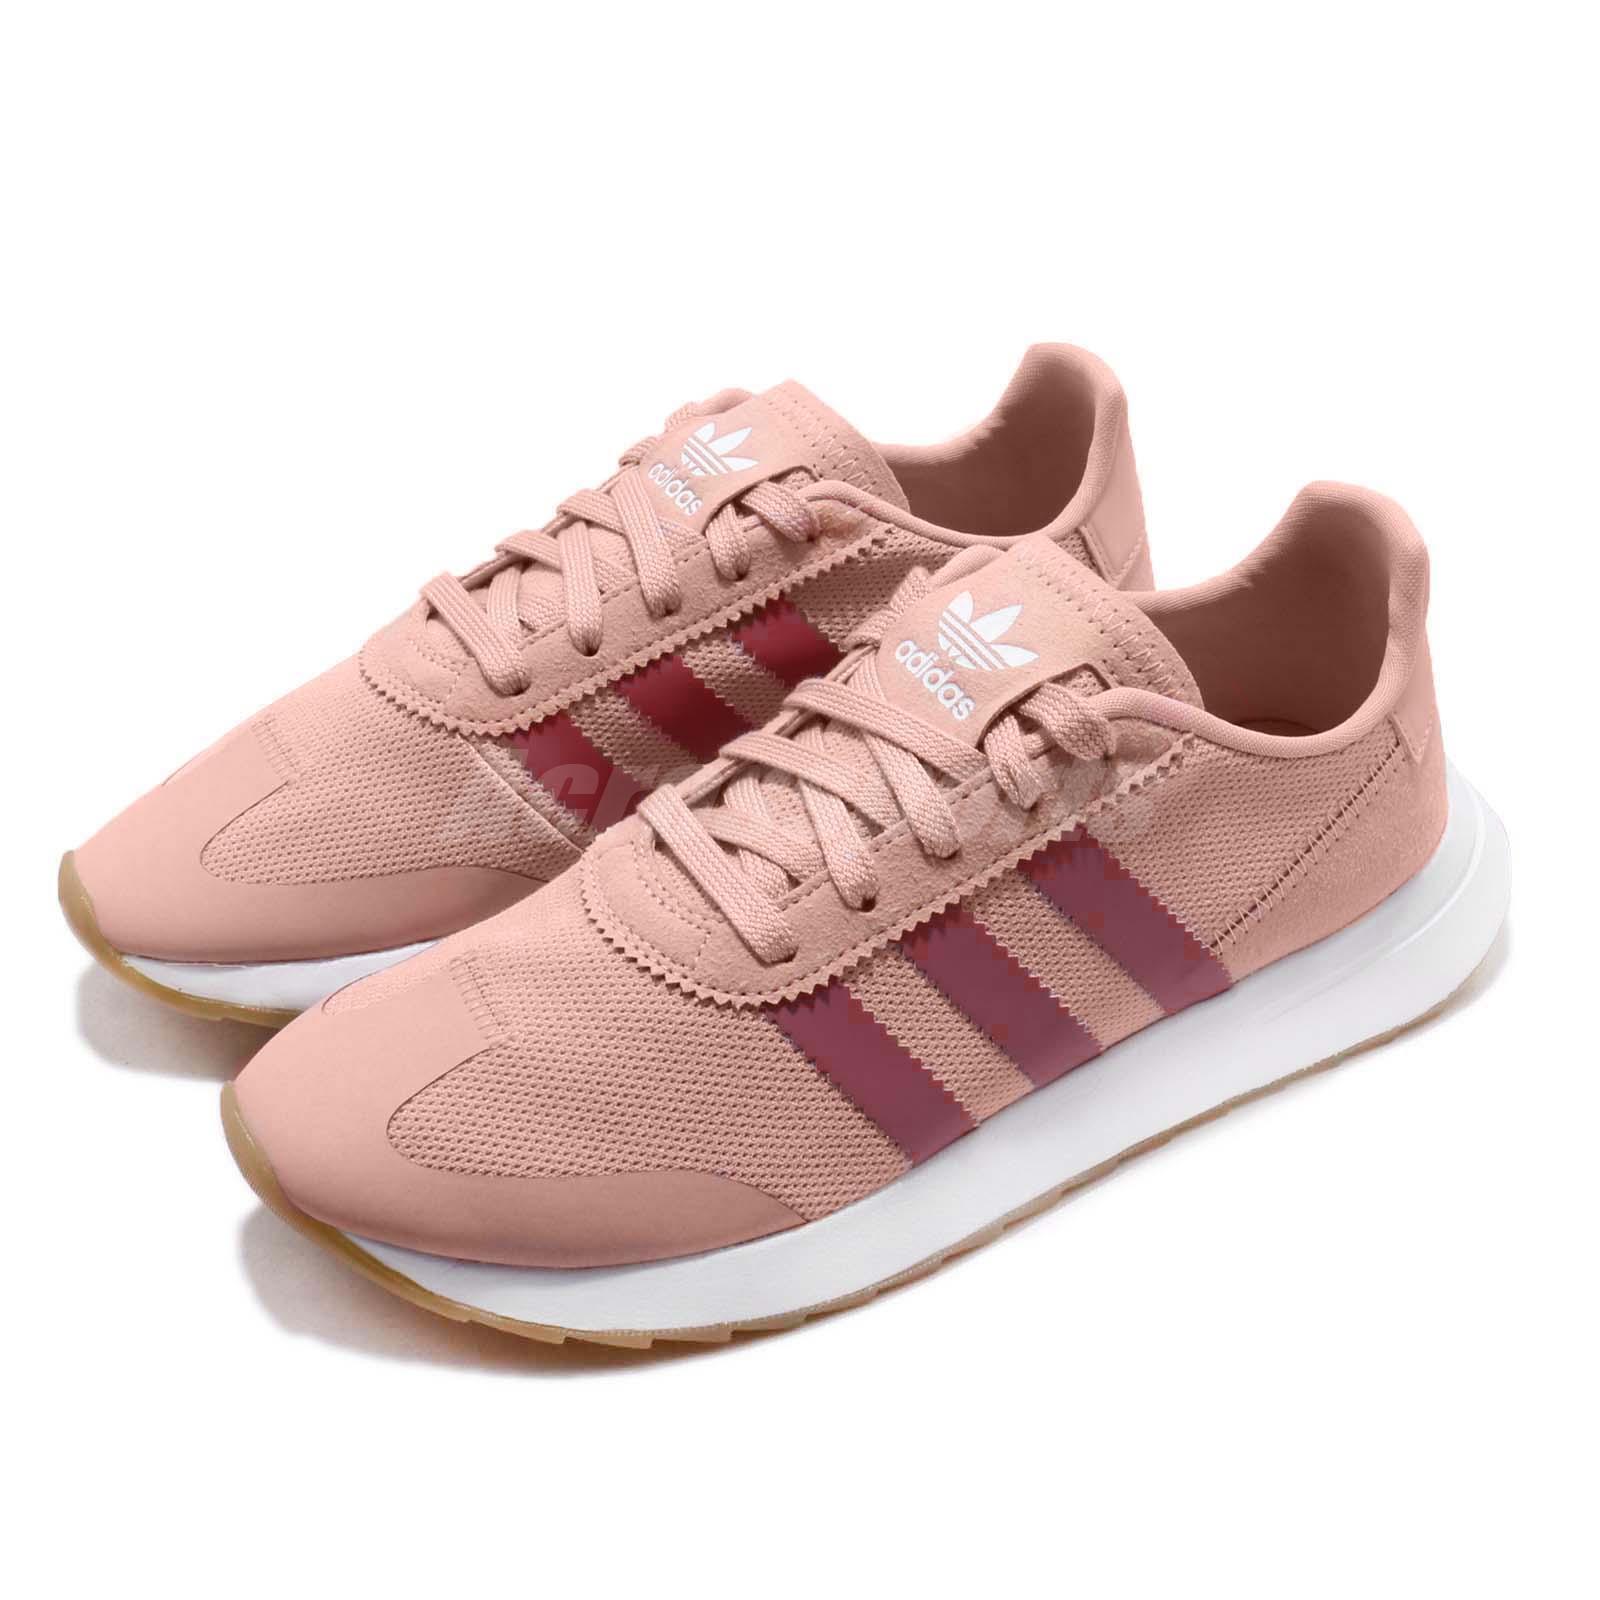 adidas Originals FLB_Runner W Pink Spirit Trace Maroon Gum Women Shoes B28047